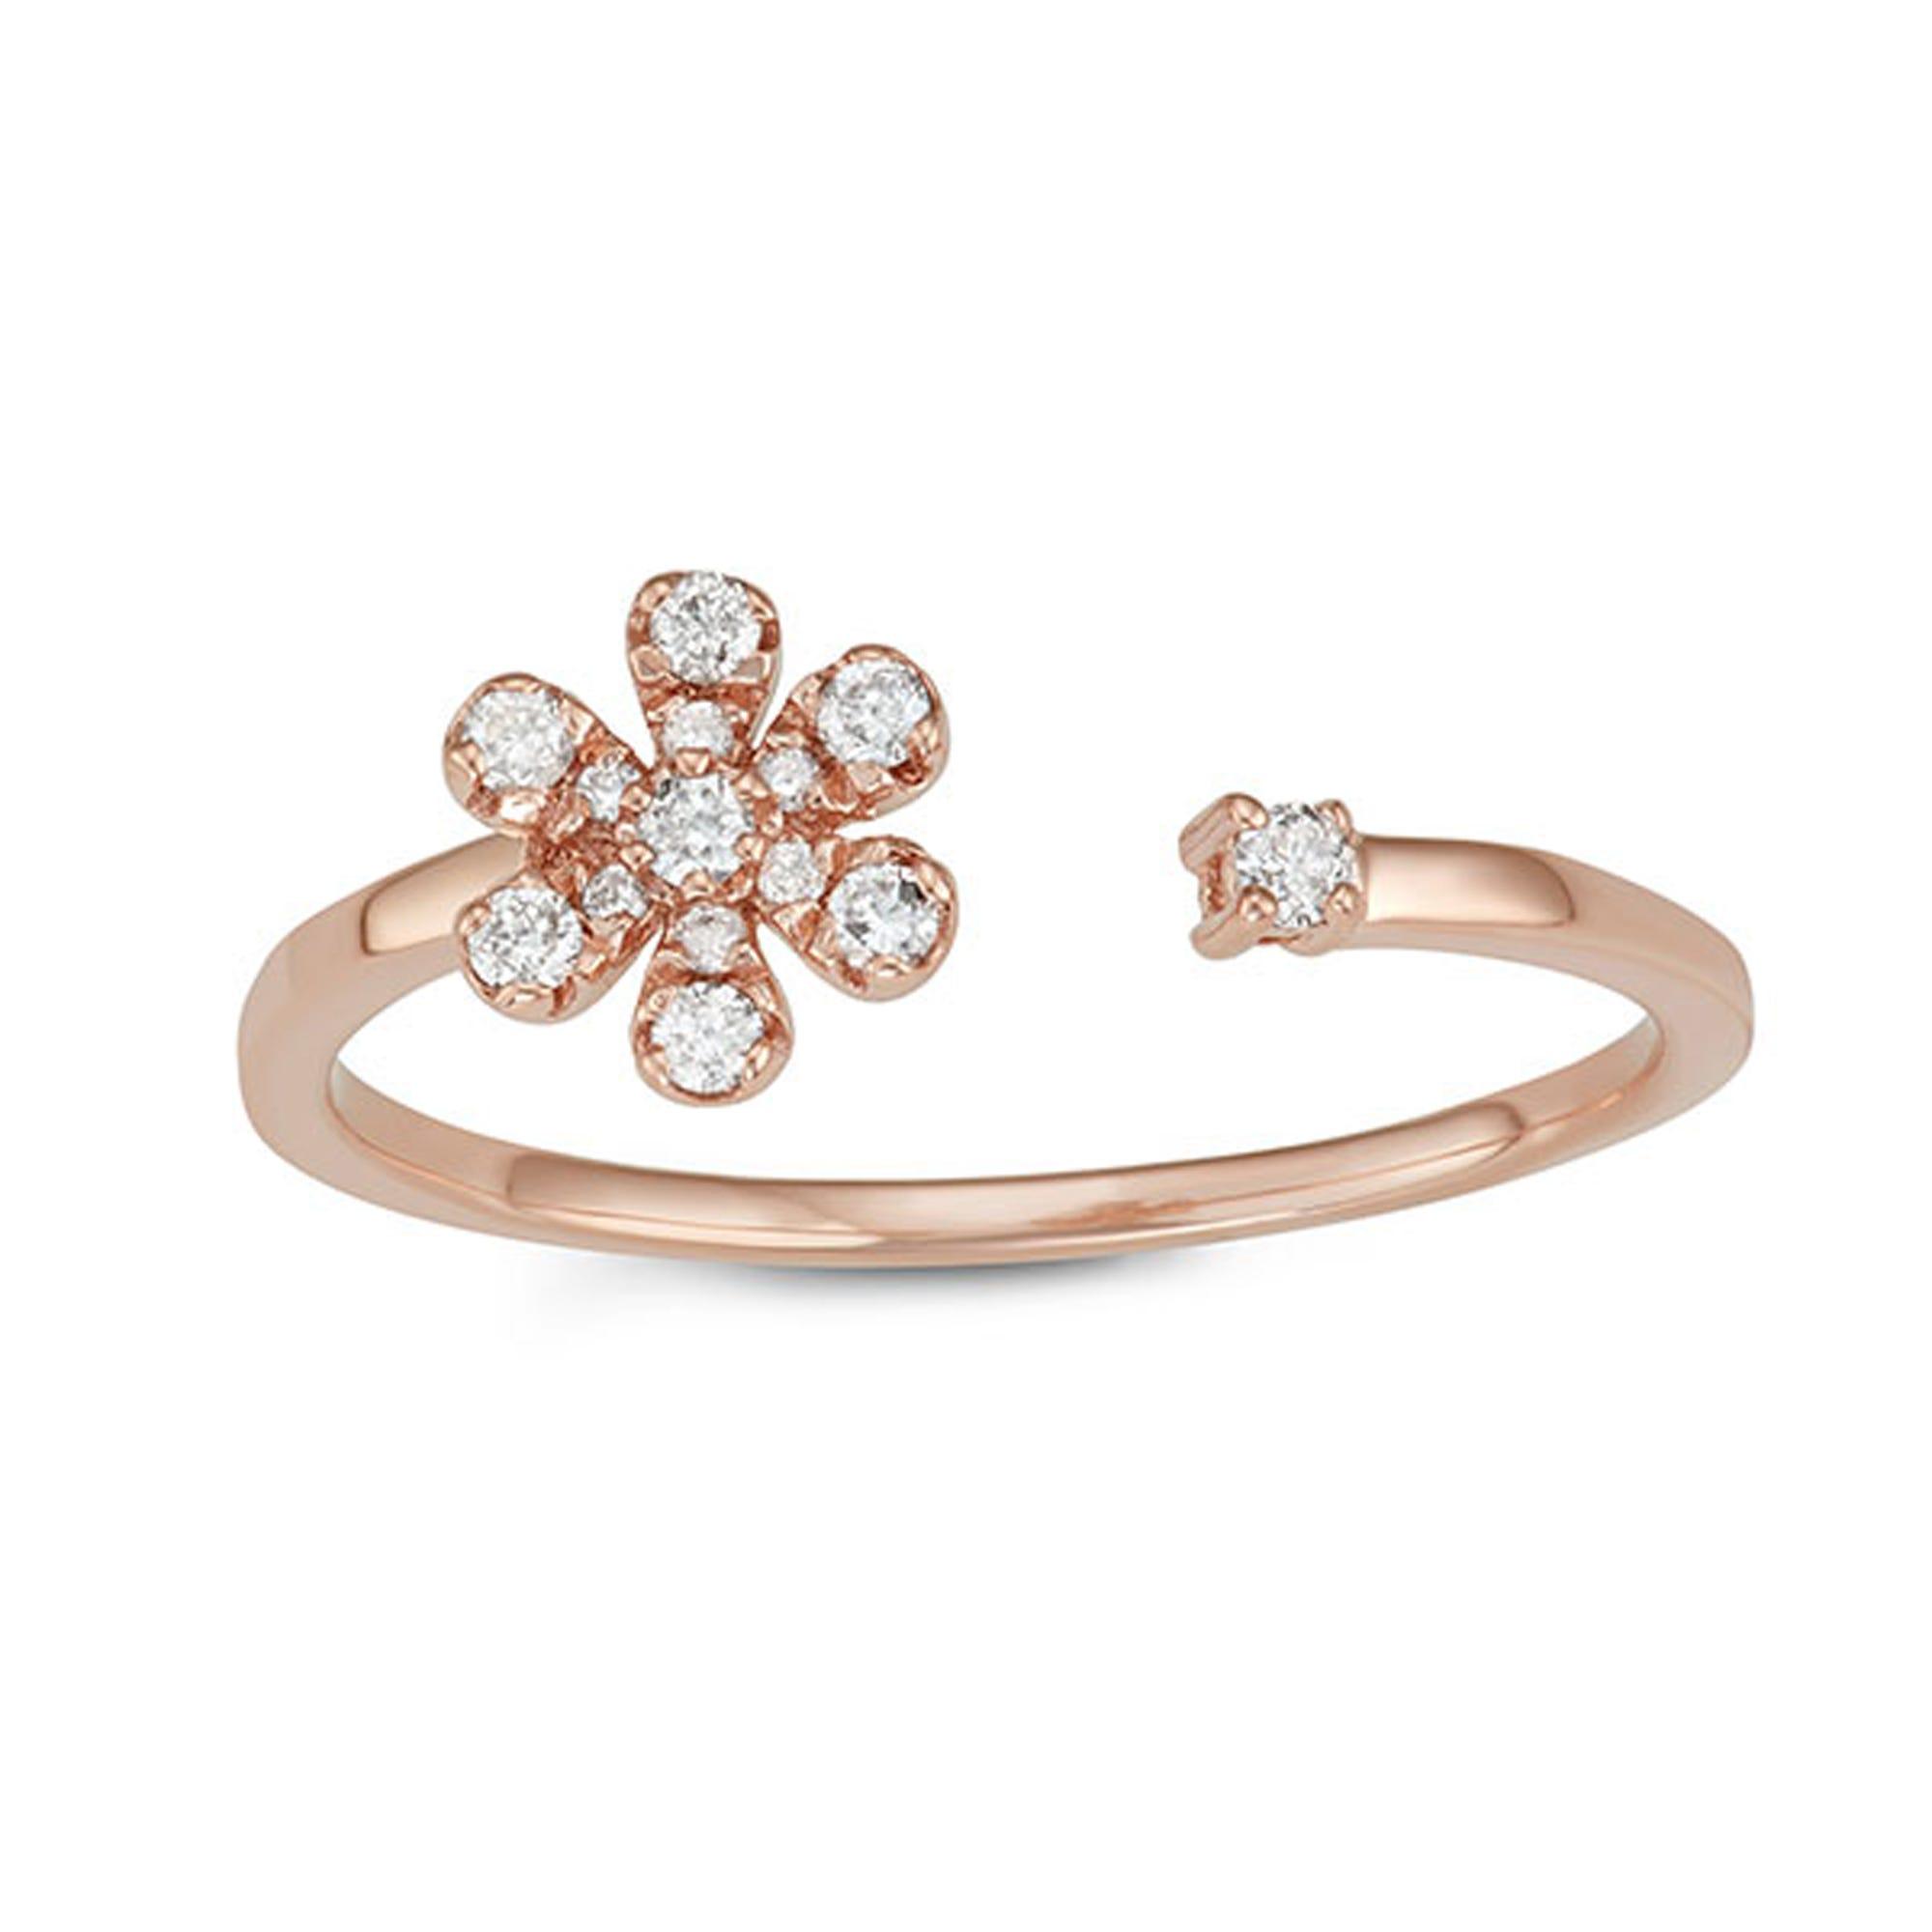 Open-Wrap Daisy Diamond Ring in 10k Rose Gold